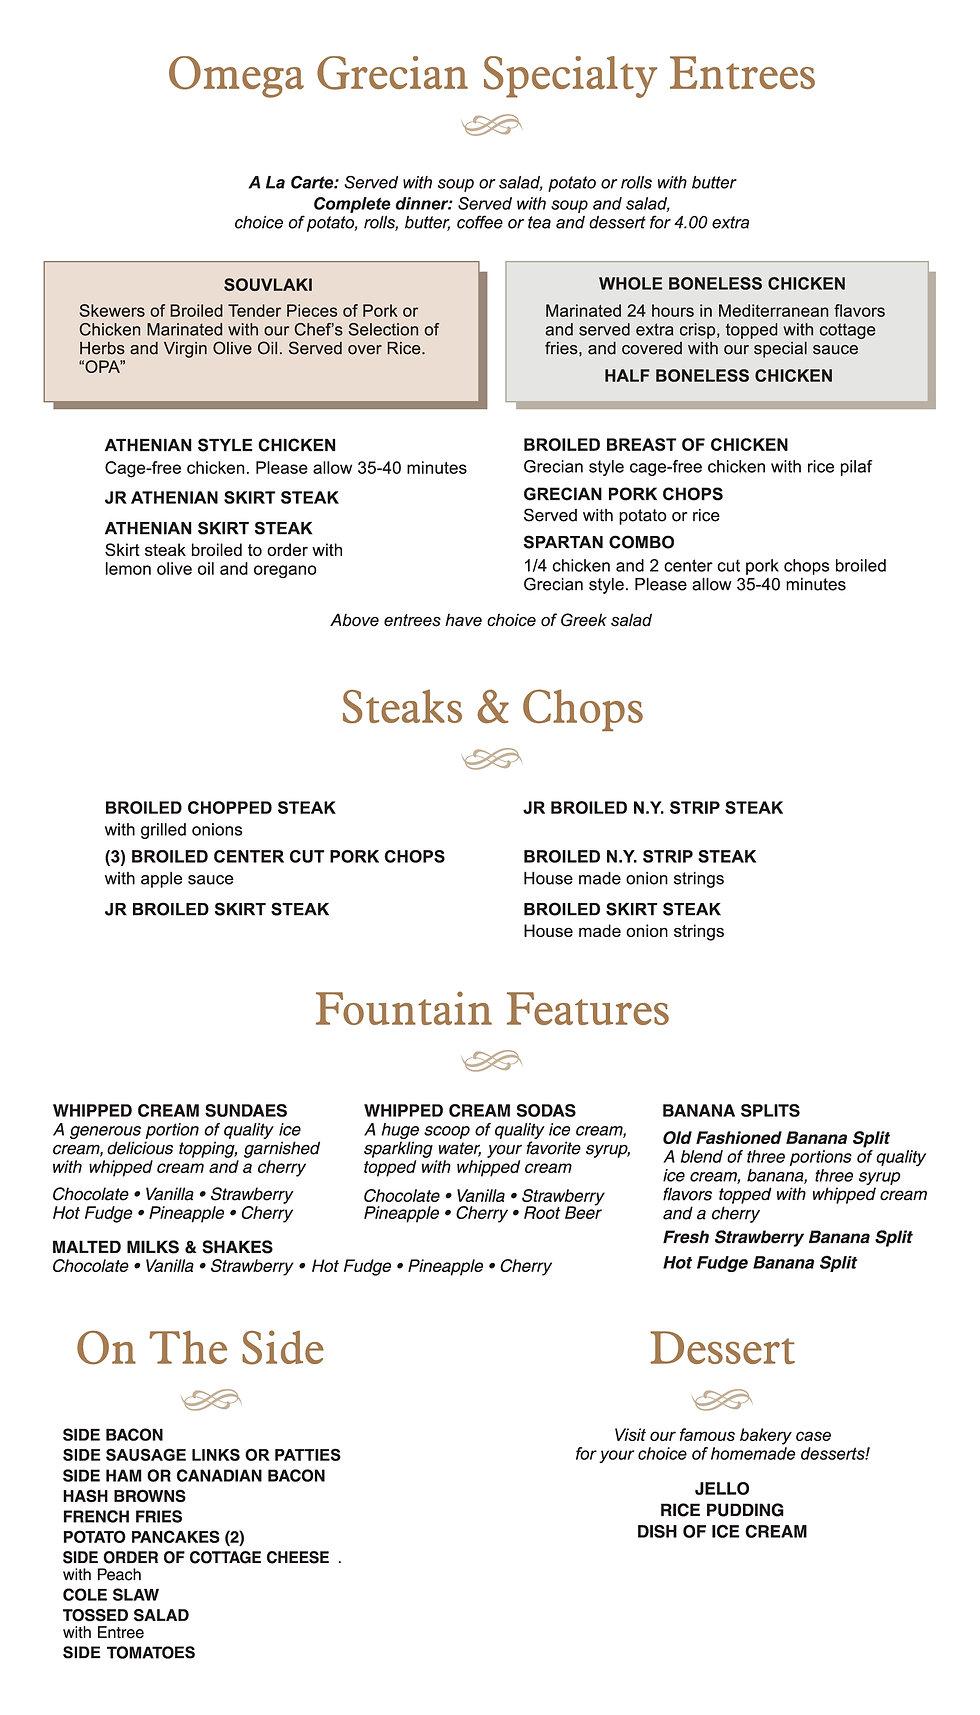 Omega_Lunch and Dinner MENU_5.jpg